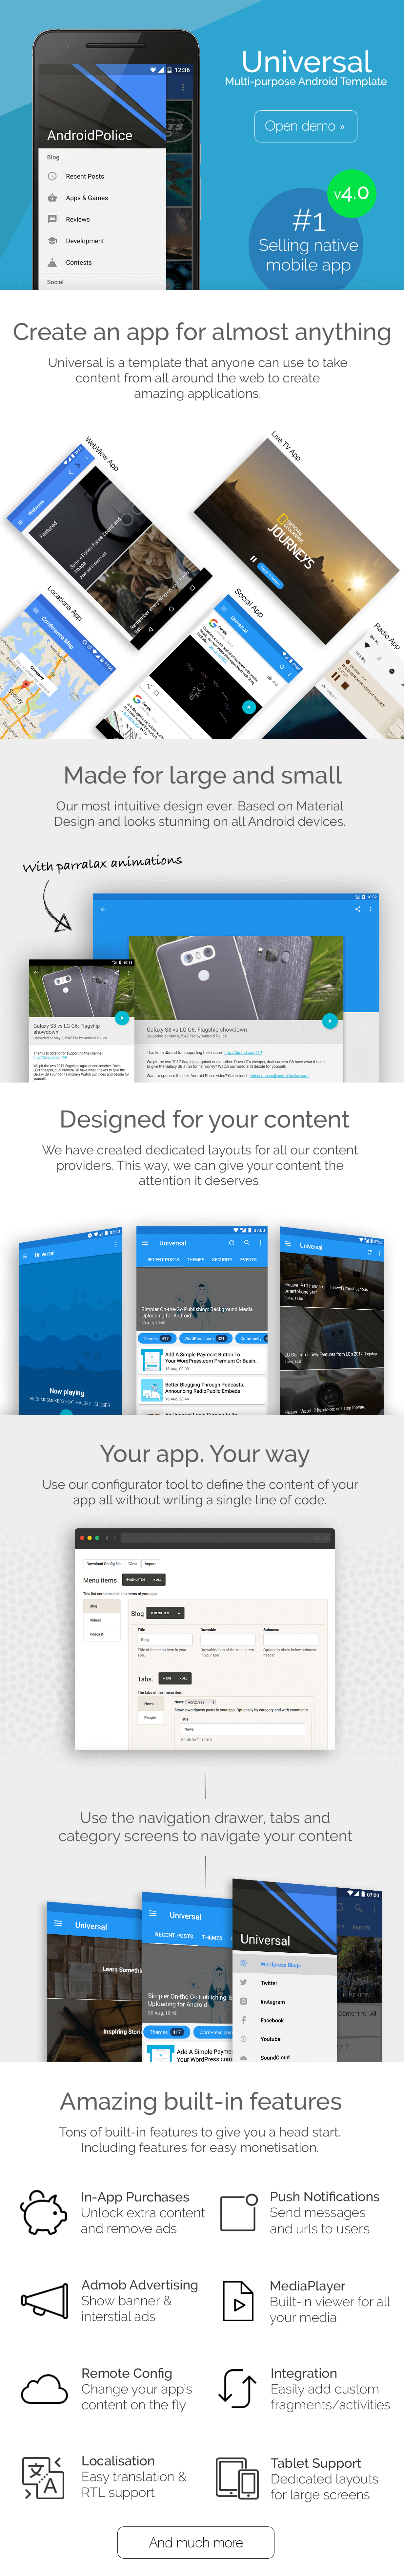 universal full multi purpose android app